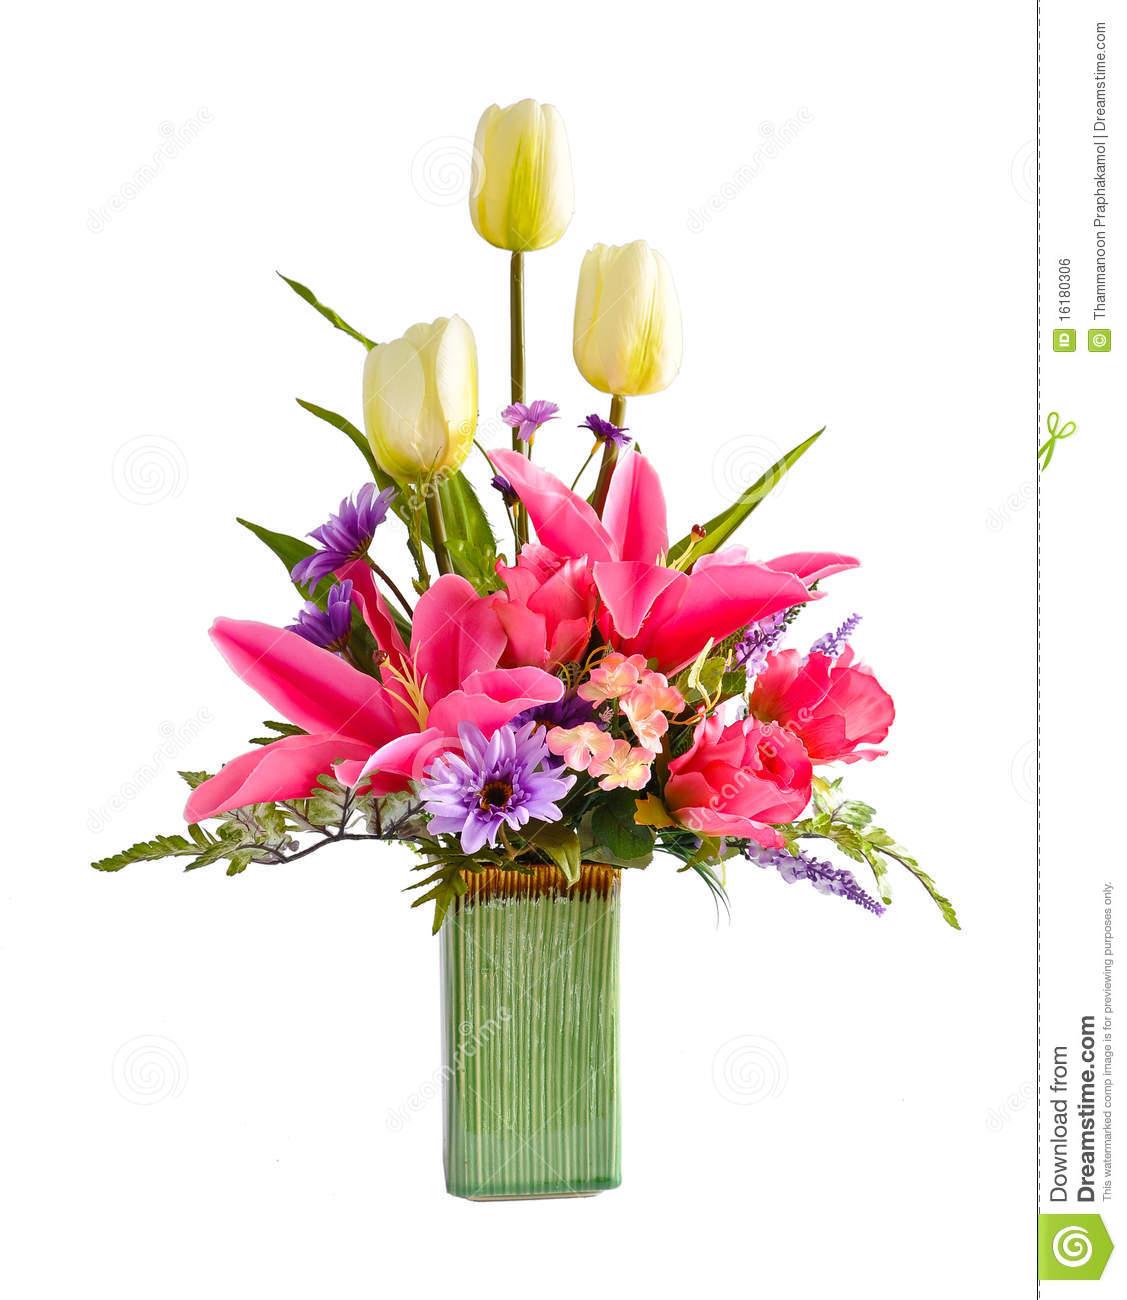 Free Flower Arrangement Pictures.